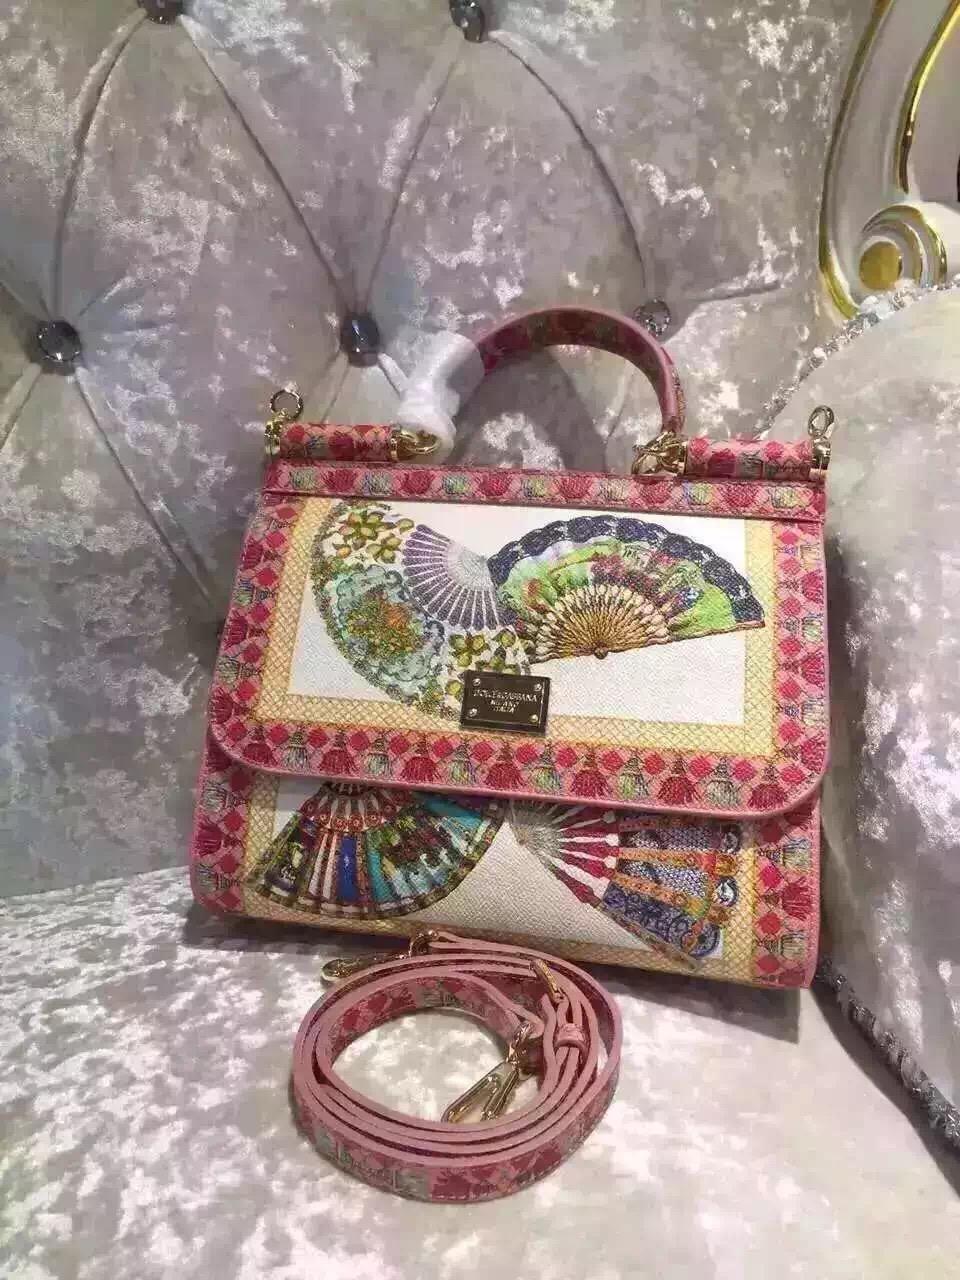 New 2016 Fashion Women printing Leather Handbag High Quality Leather Women Bag Vintage Shoulder Bag Messenger Bag Ladies Bag